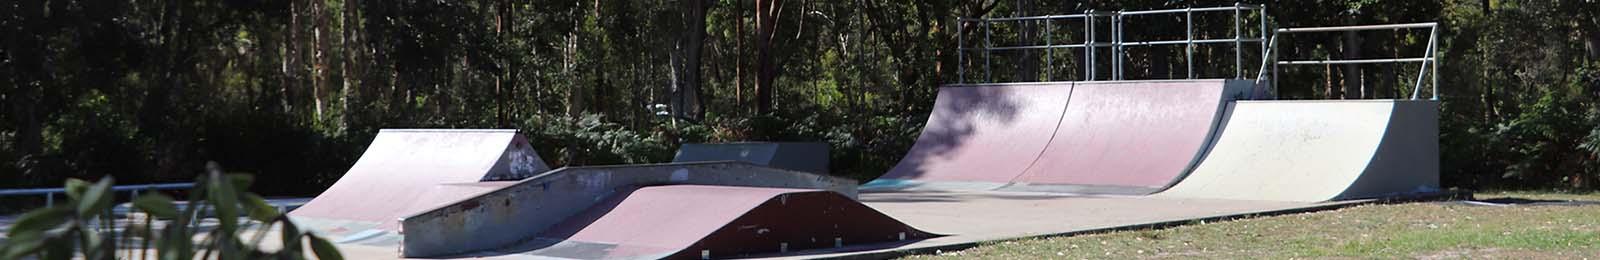 Mallabula skate park top